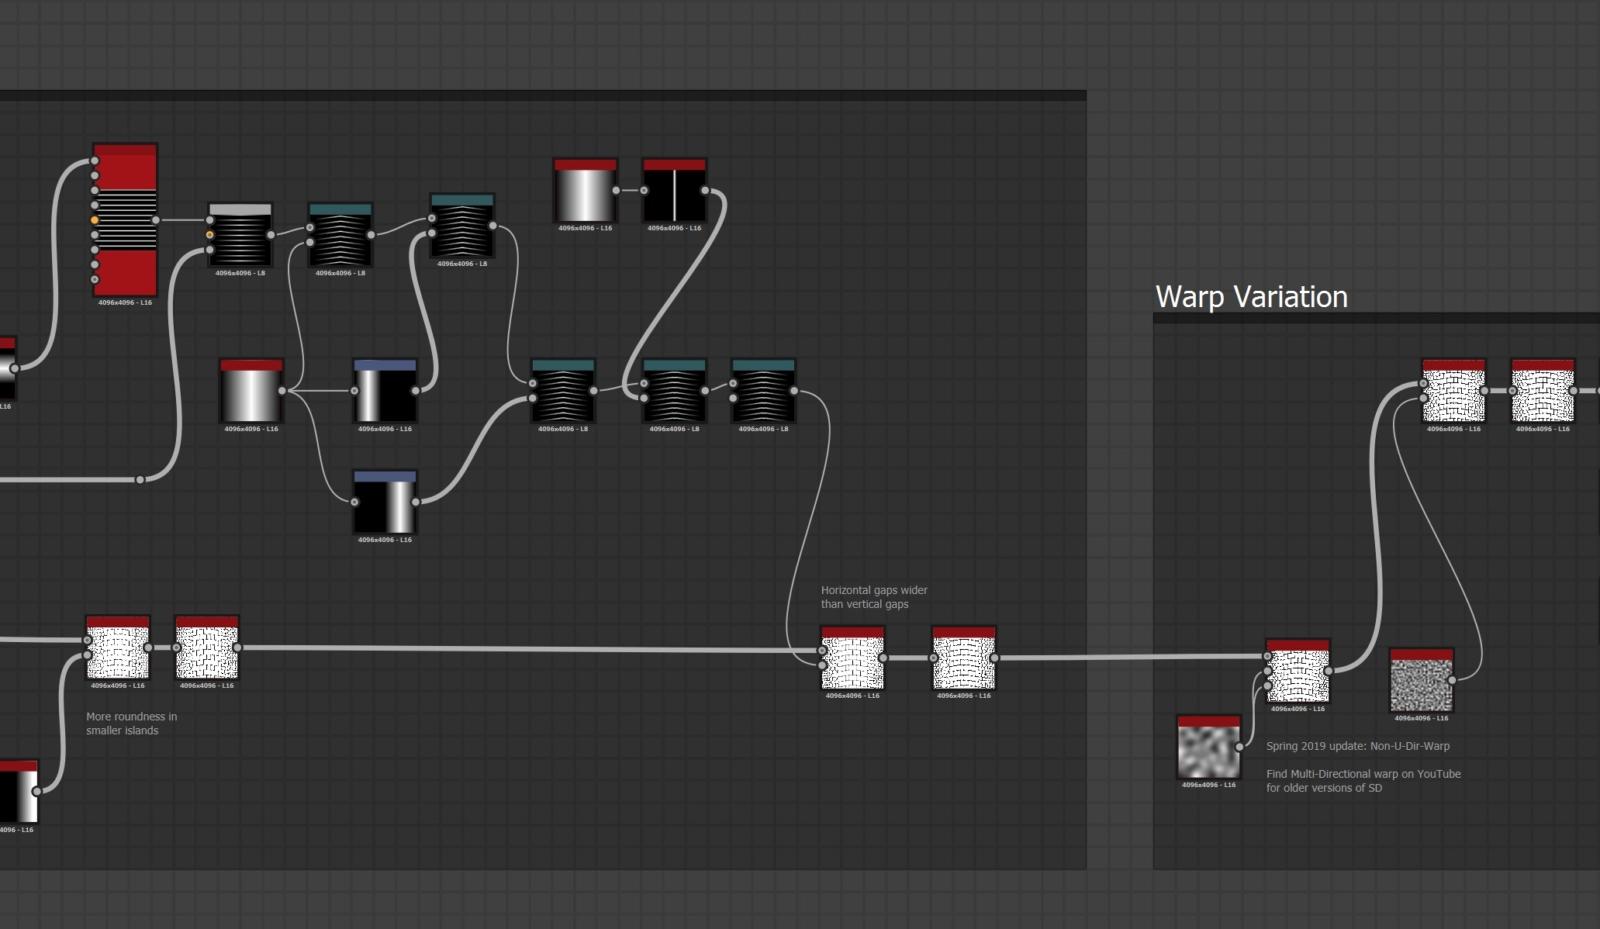 三维材质纹理贴图制作软件 Substance Designer 2020.1.2 v6.1.2.349 Win破解版插图(6)